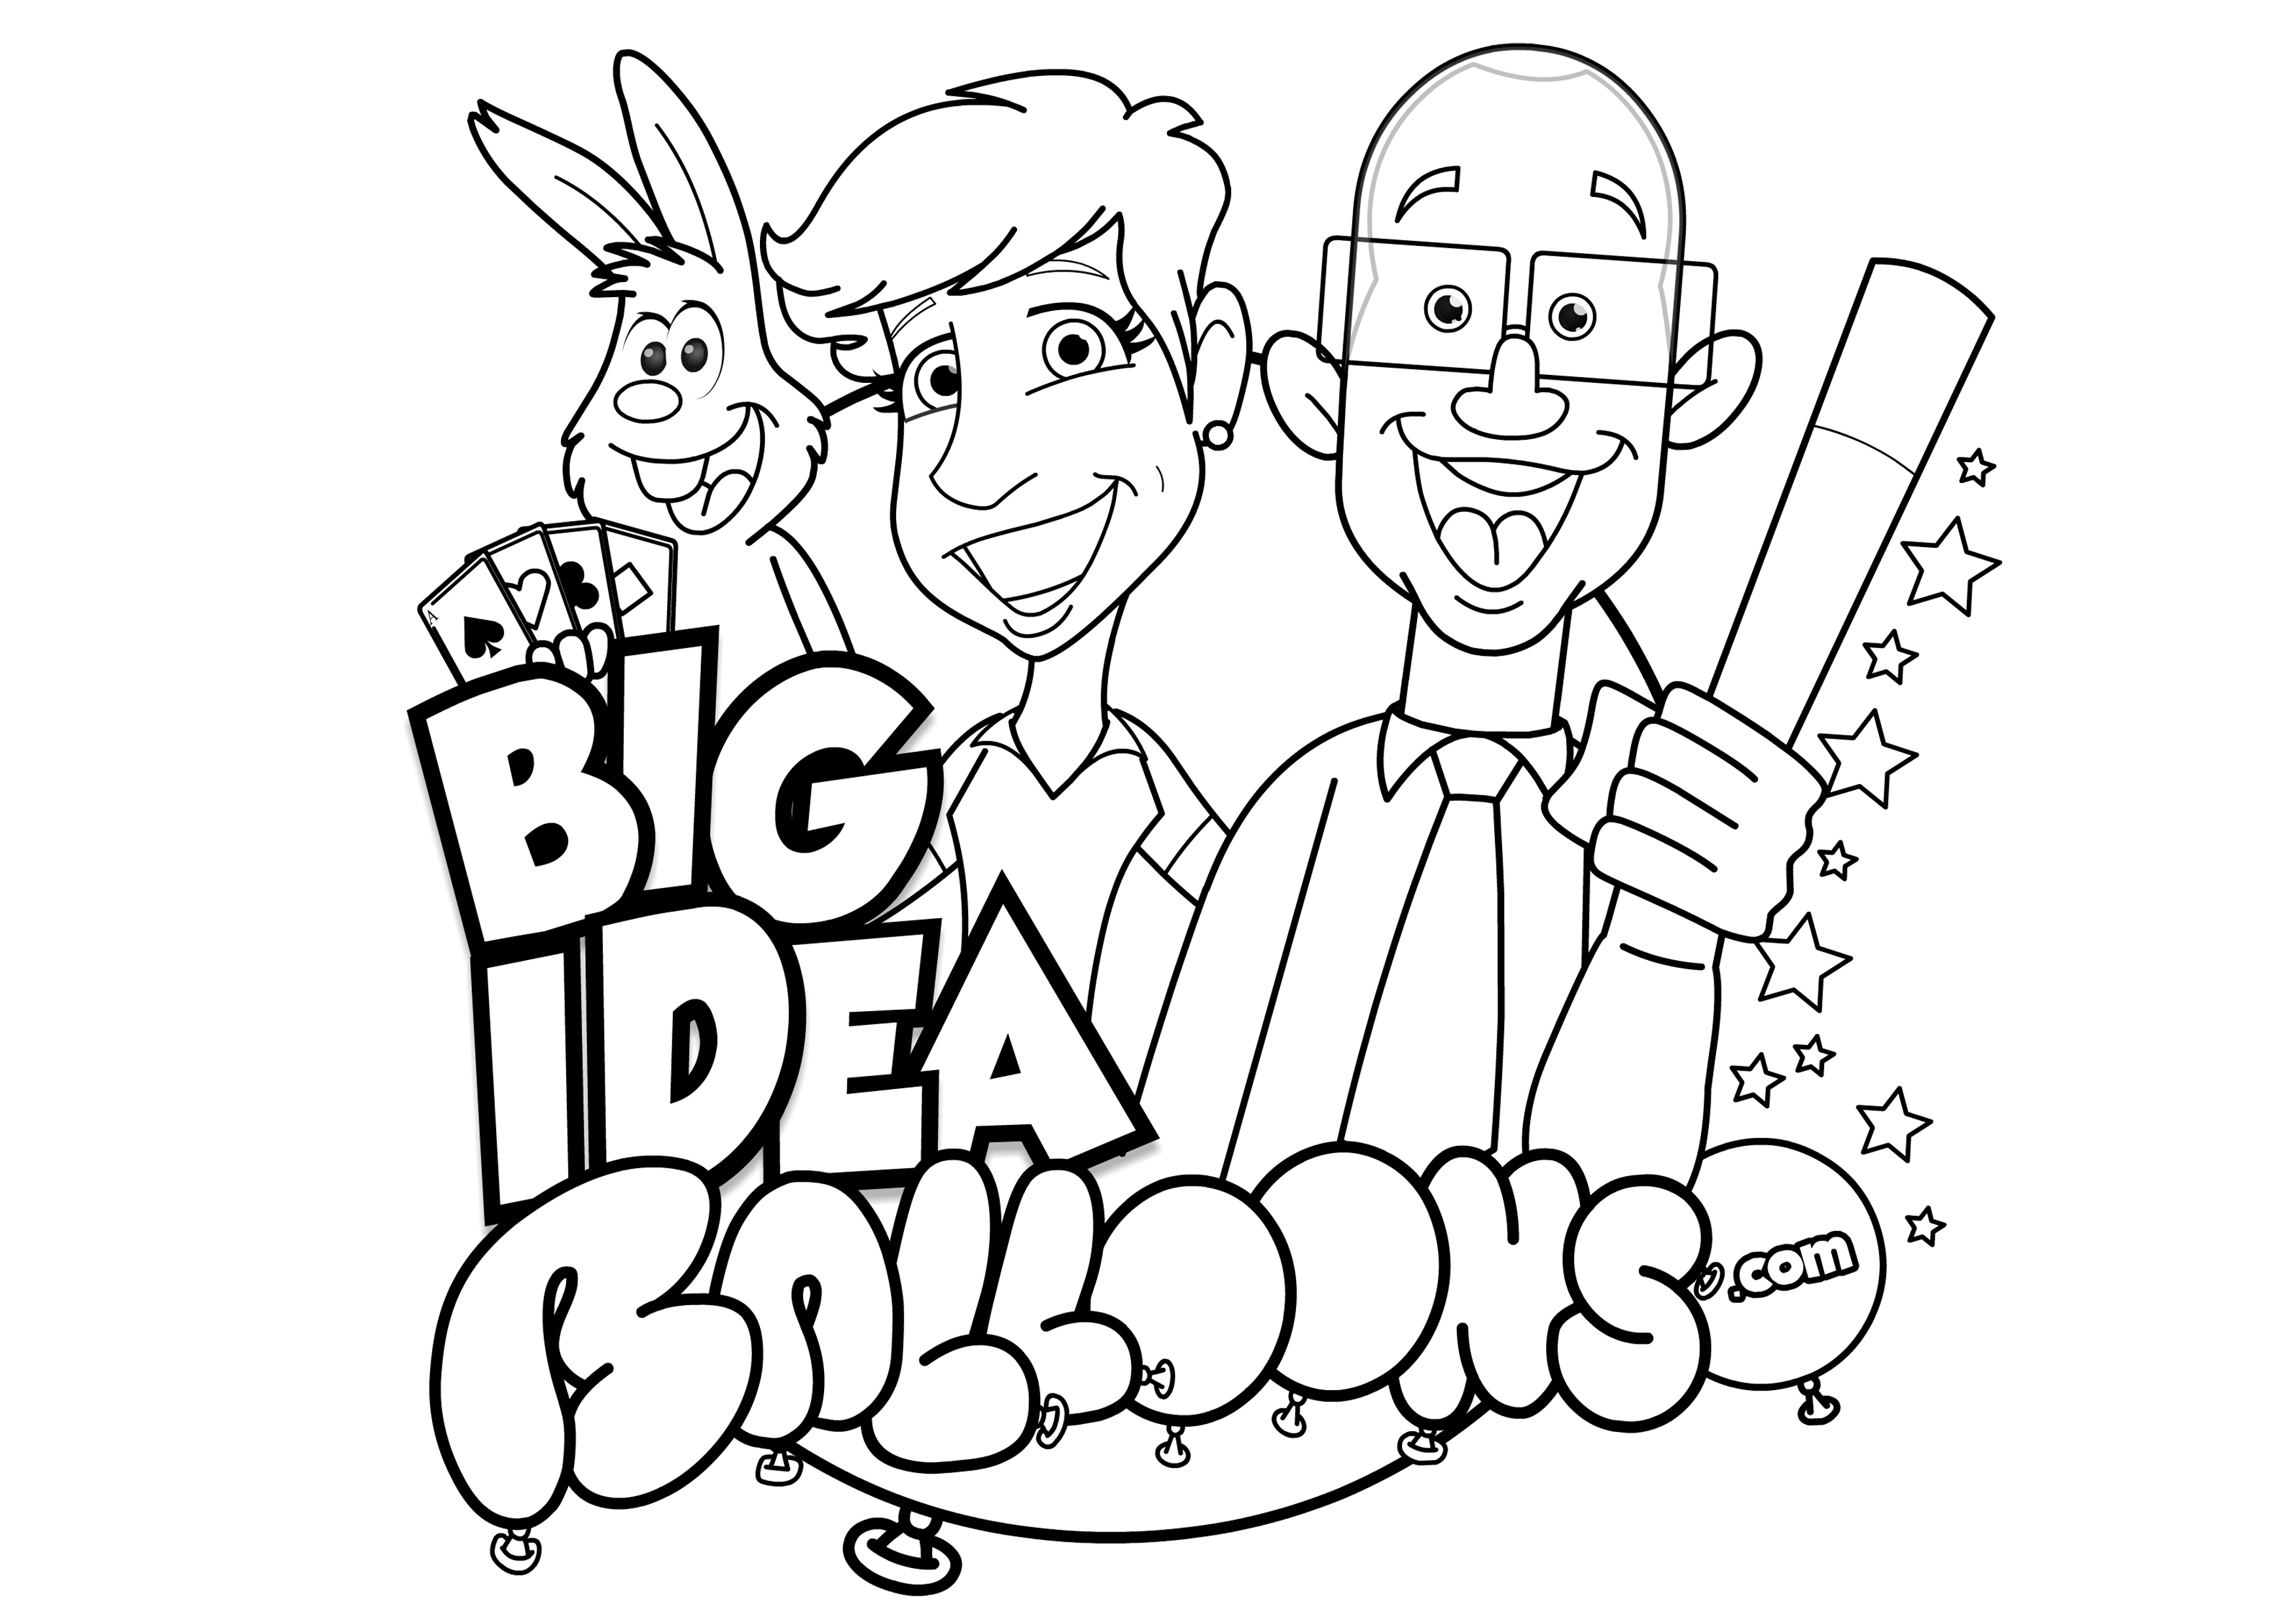 Big Ideas A4 colouring sheet